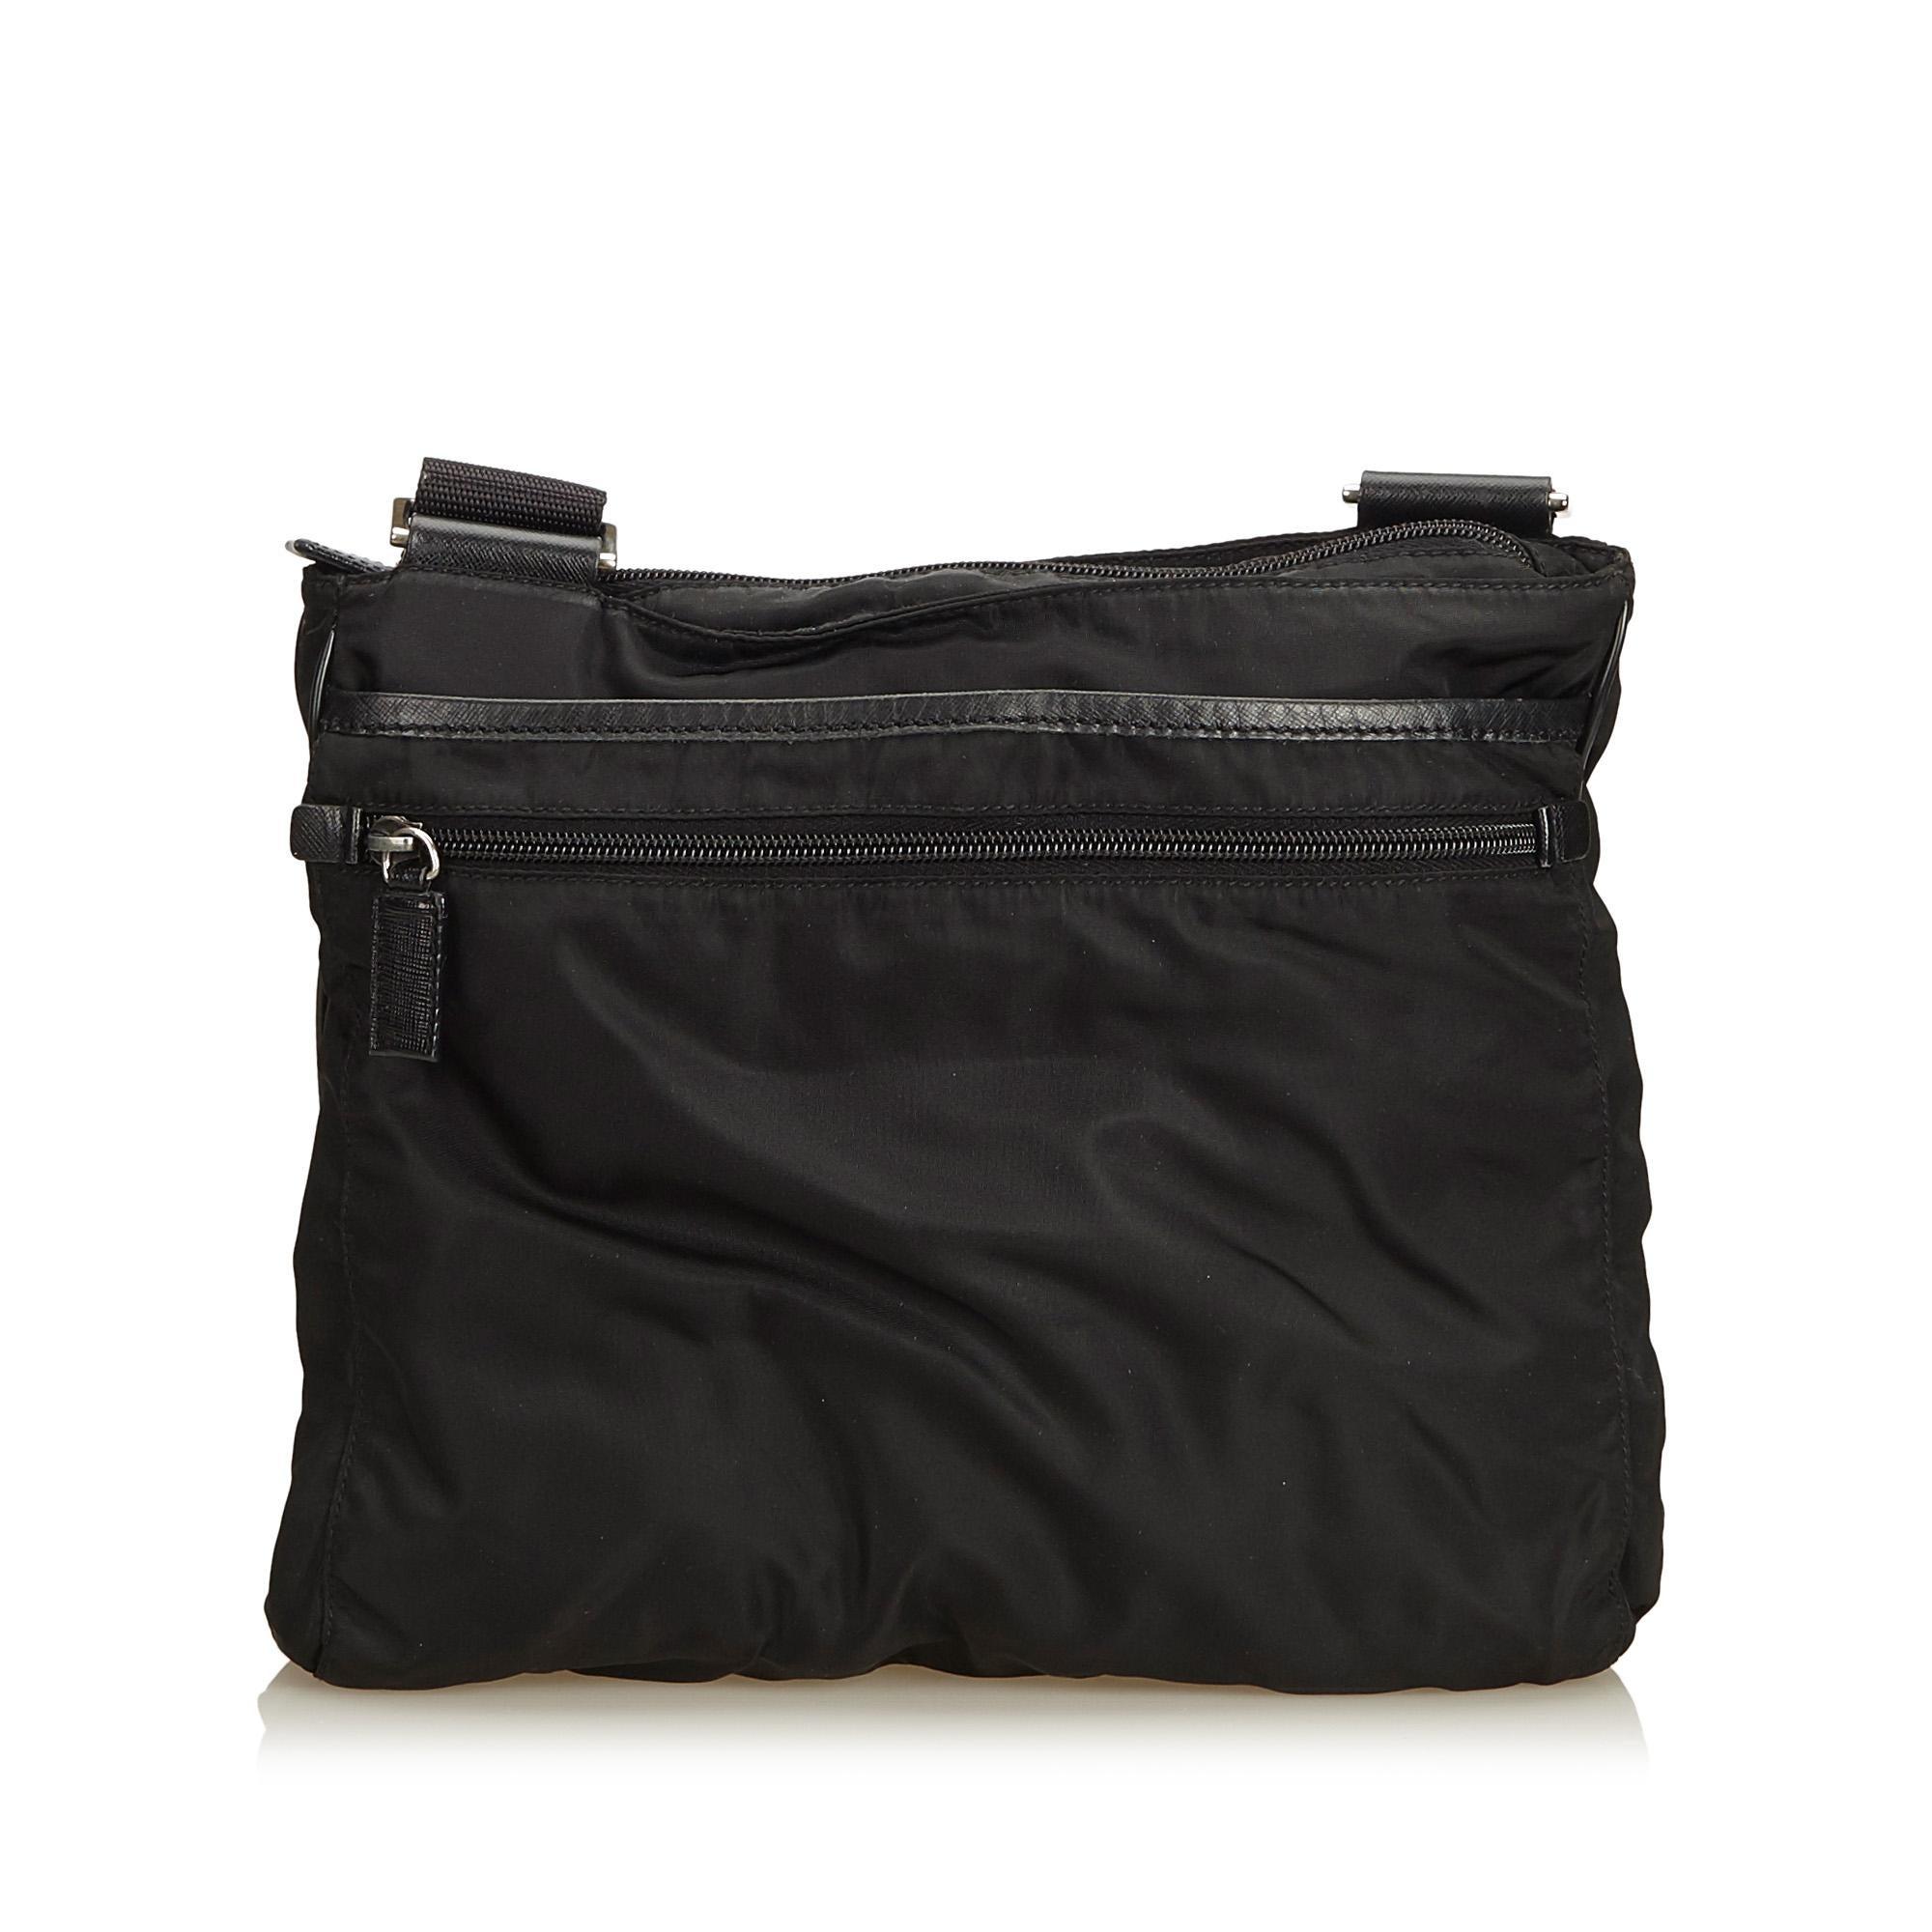 439529a7e81281 Prada Black Tessuto Nylon Crossbody Bag at 1stdibs